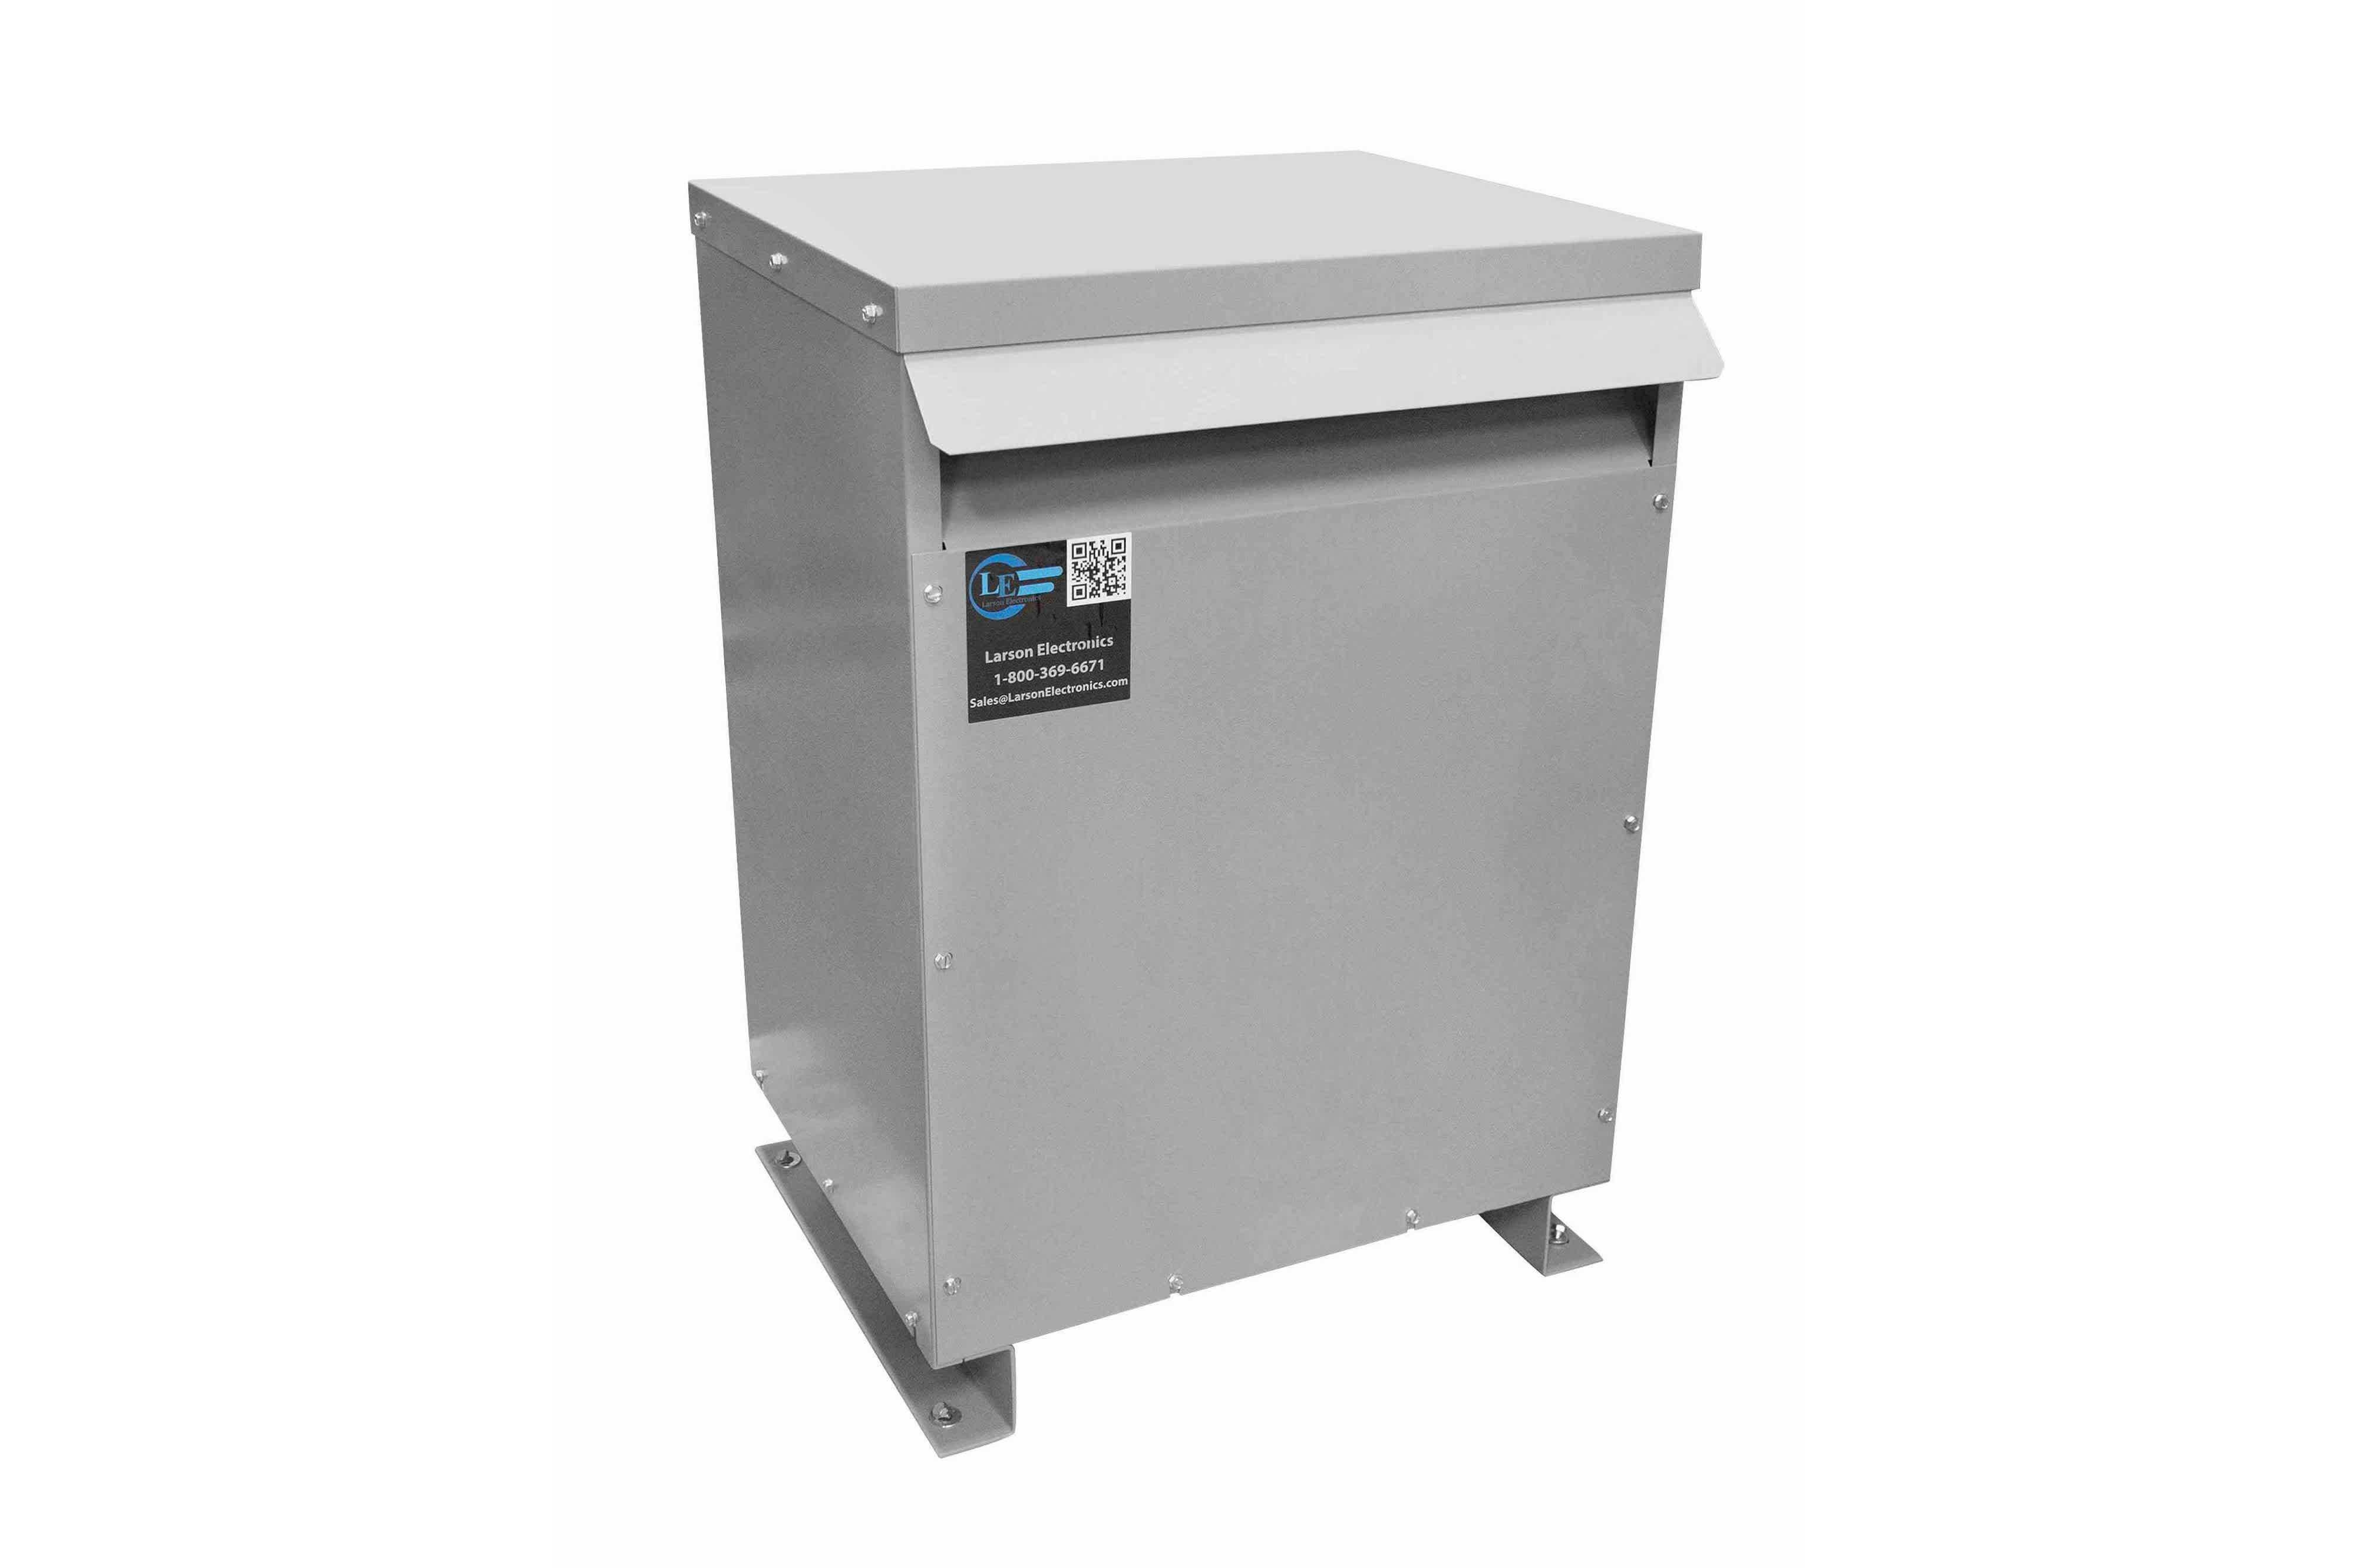 275 kVA 3PH Isolation Transformer, 220V Wye Primary, 208V Delta Secondary, N3R, Ventilated, 60 Hz